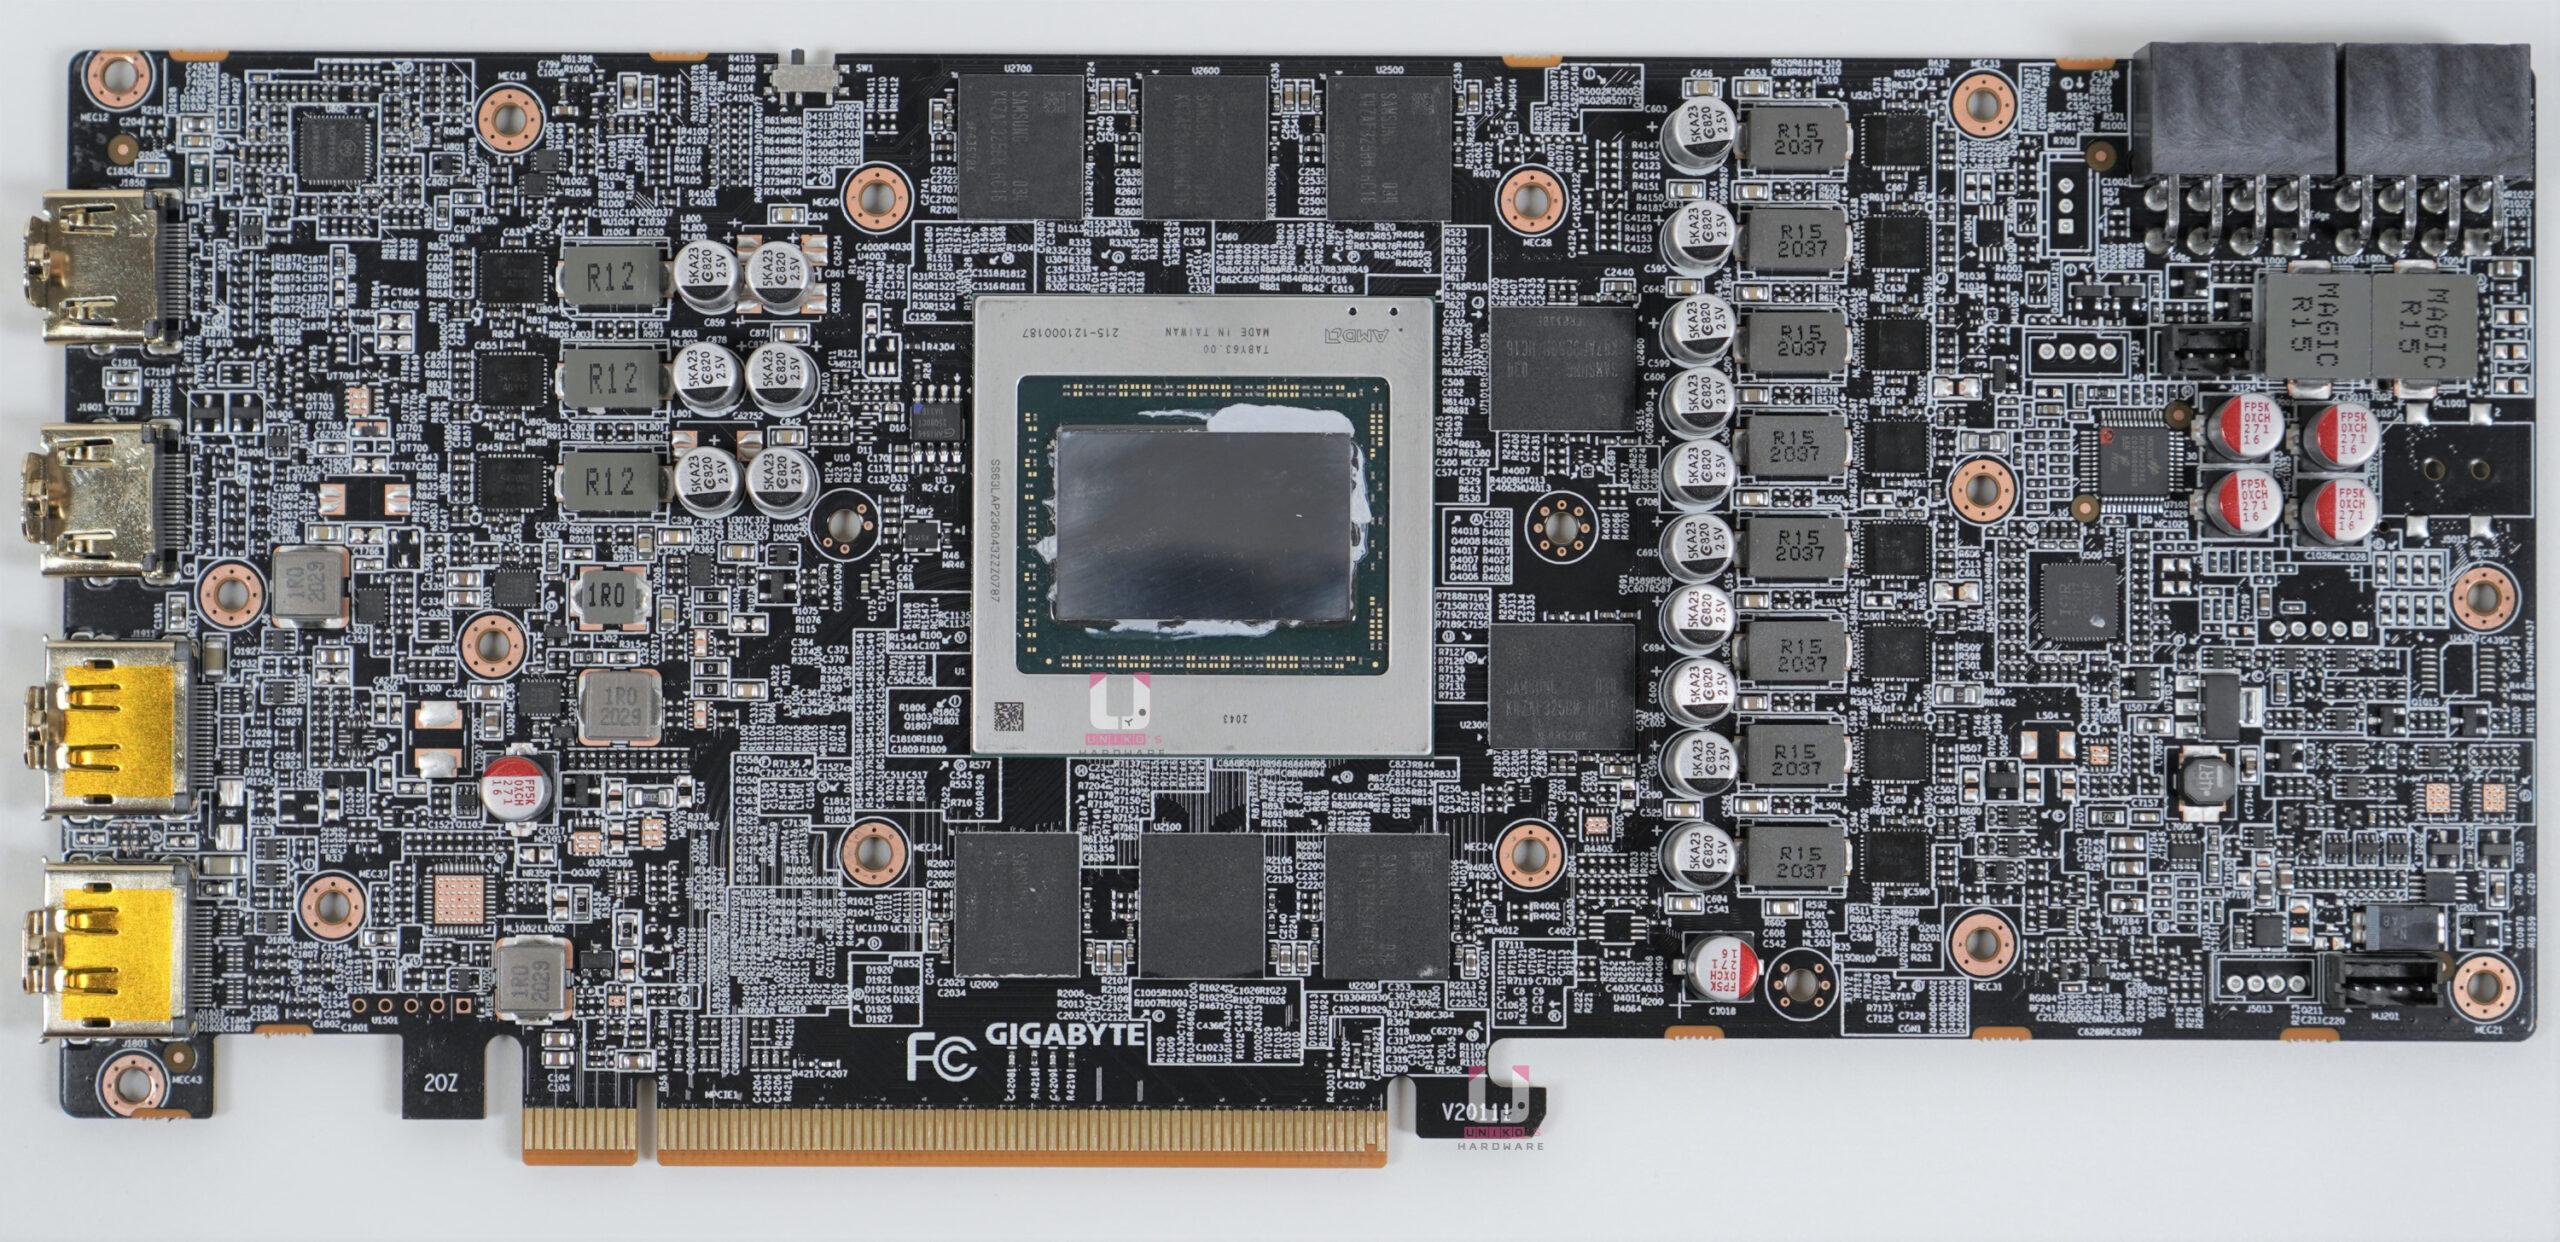 GIGABYTE Radeon RX 6800 GAMING OC 16G PCB 正面高解析度照片,可以點入放大看上面的元件。